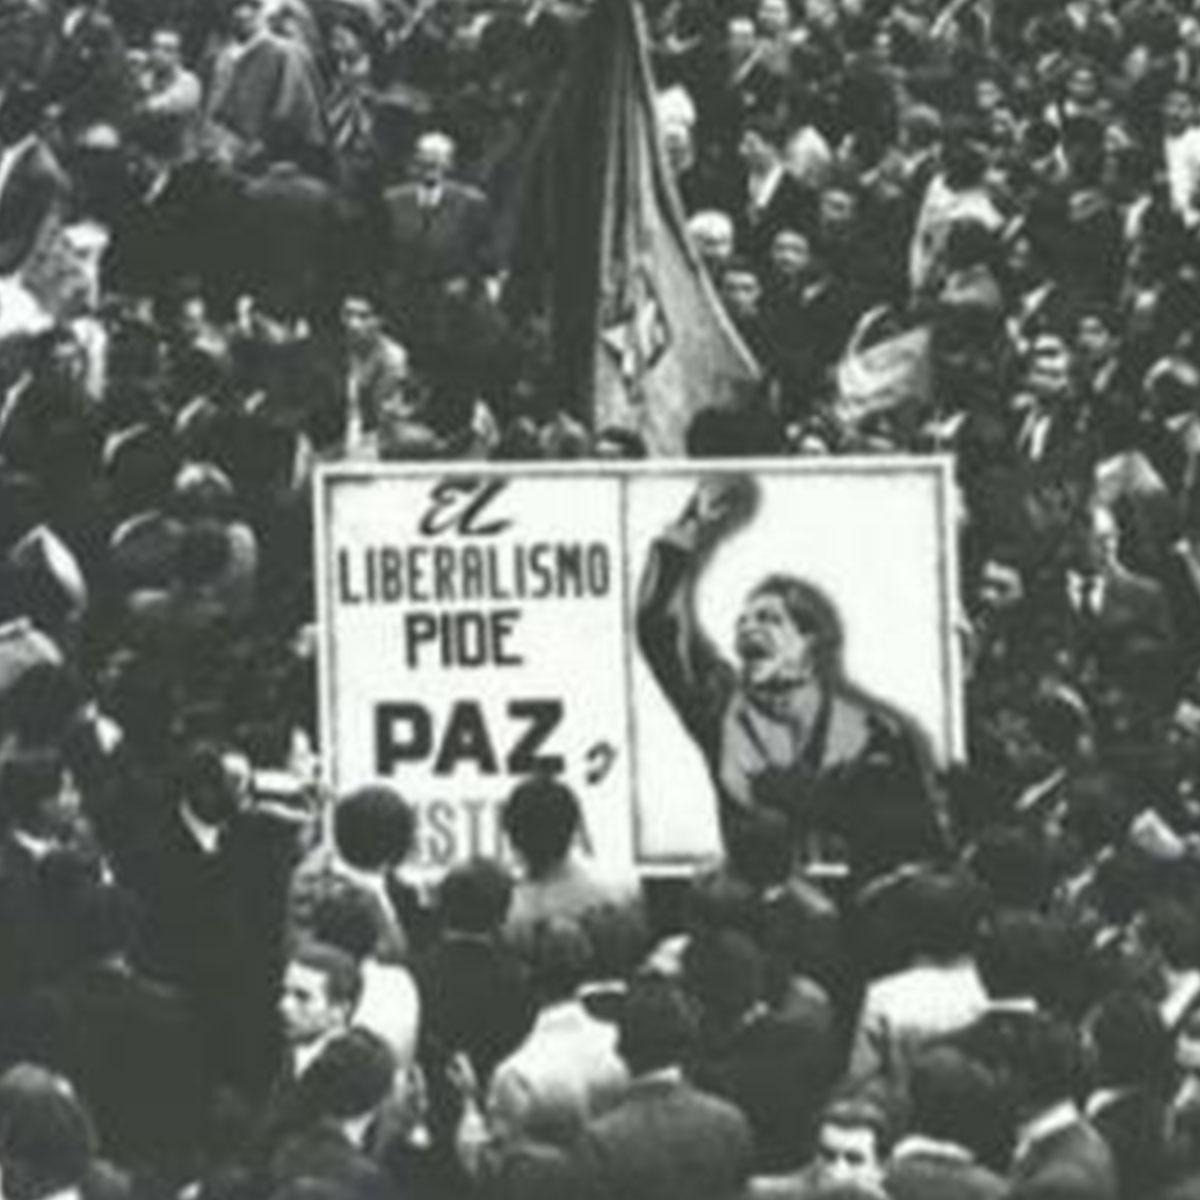 foto antigua con cartel alusivo a Jorge Eliecer Gaitán